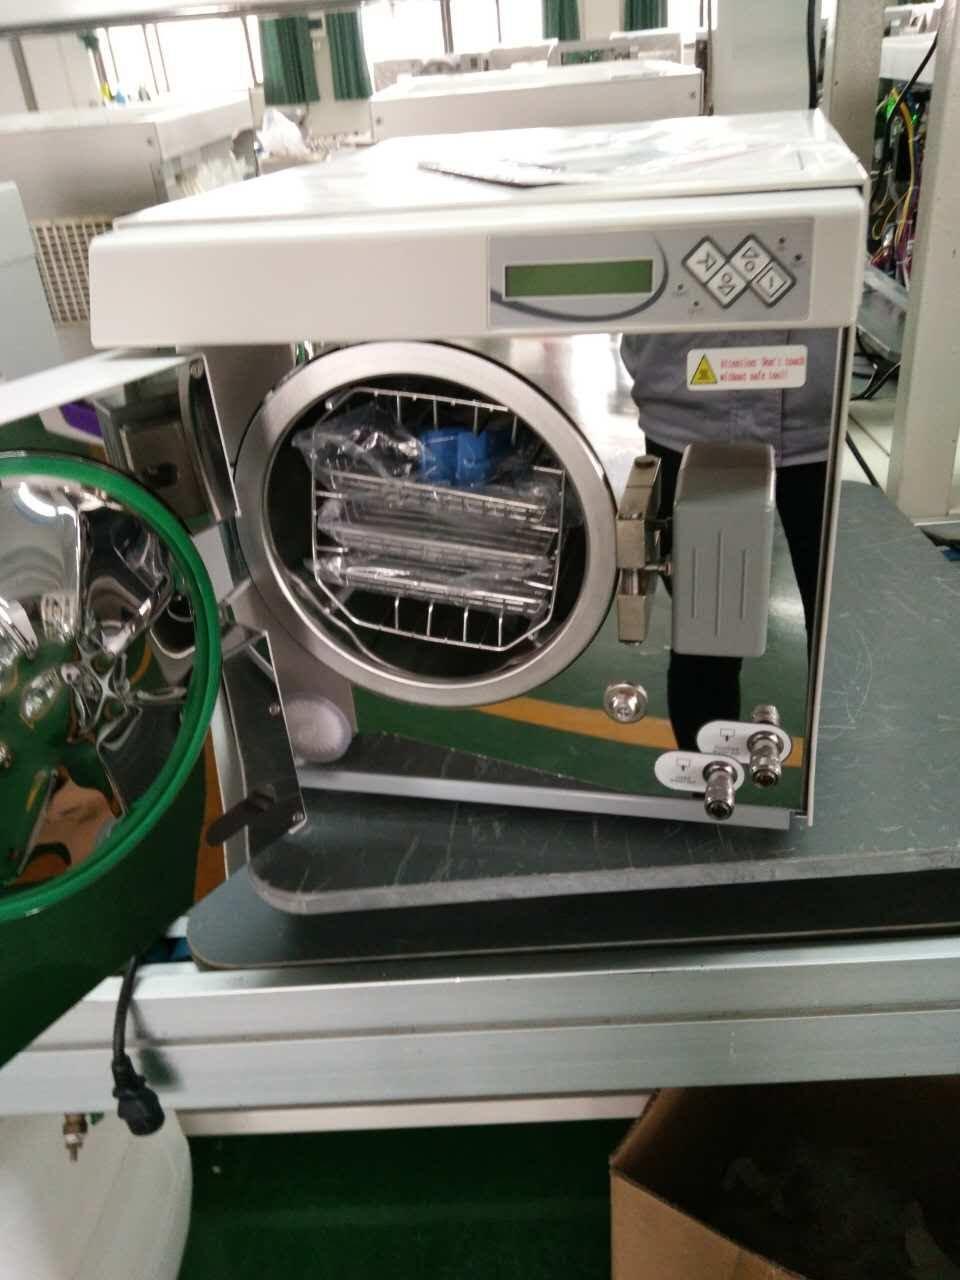 Dental Mini Autoclave - Zeta 8L New Sterilizer Medical Vacuum with LCD Screen Class B